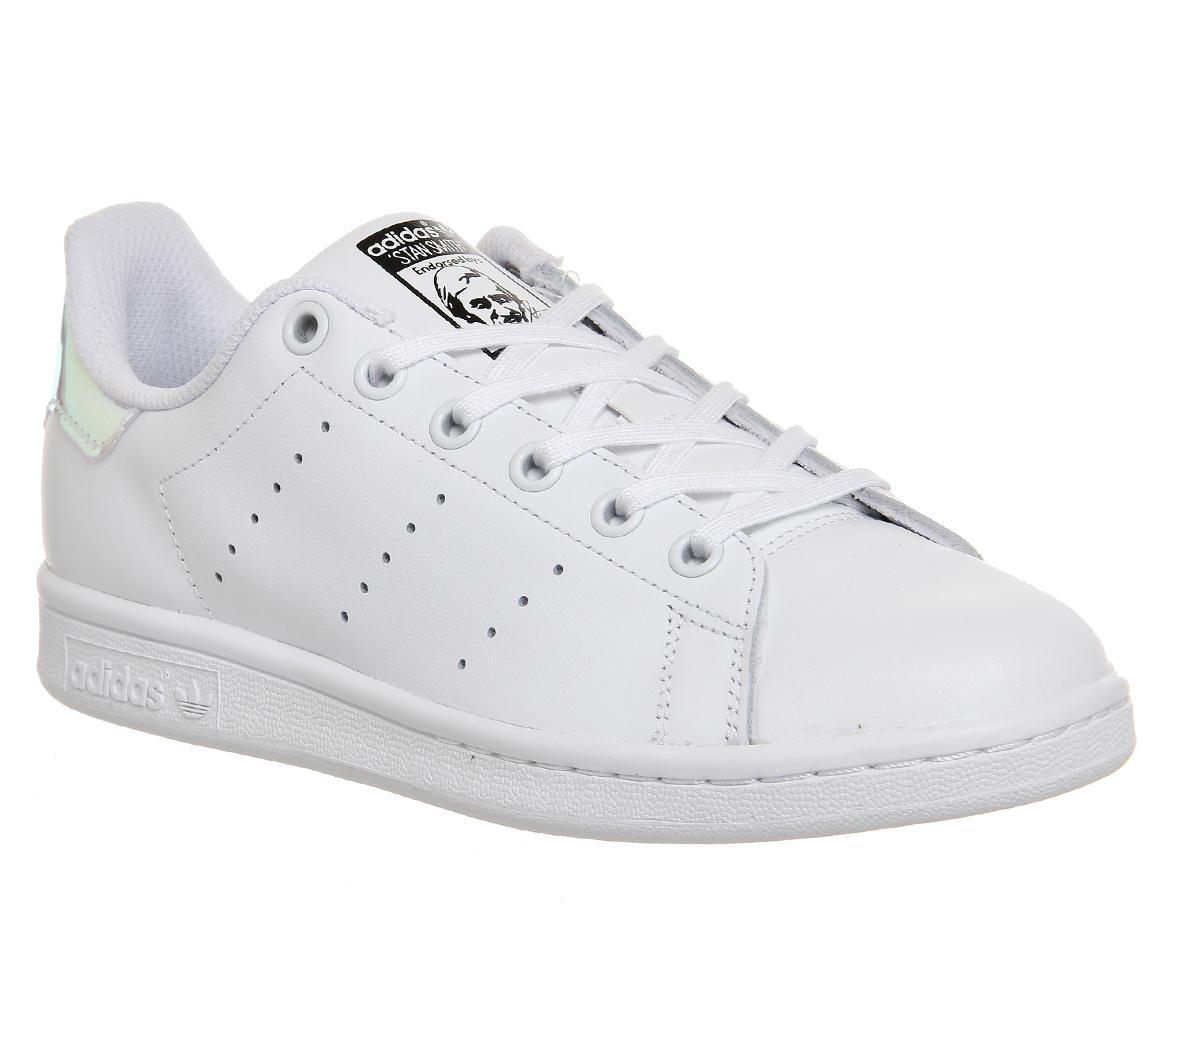 adidas superstar gs white metallic silver juniors